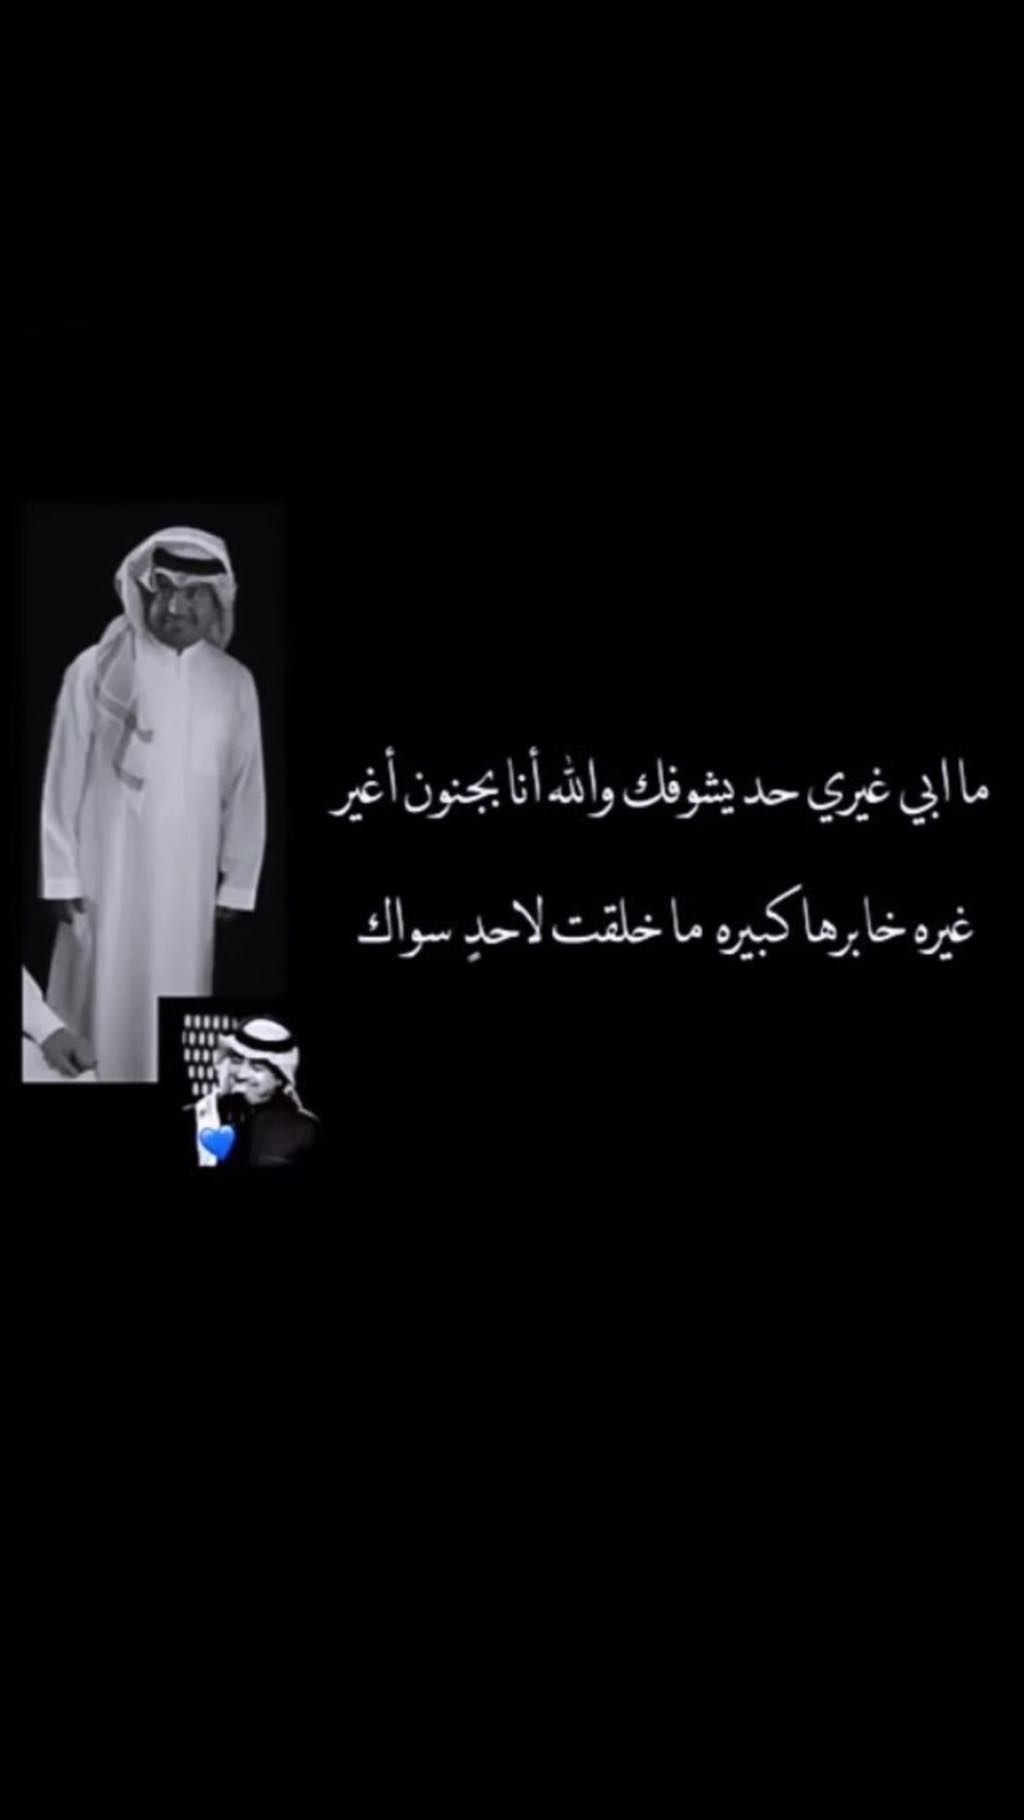 راشد الماجد راشديات خلفيات راشد راشد الماجد Love Smile Quotes Funny Arabic Quotes Beautiful Arabic Words